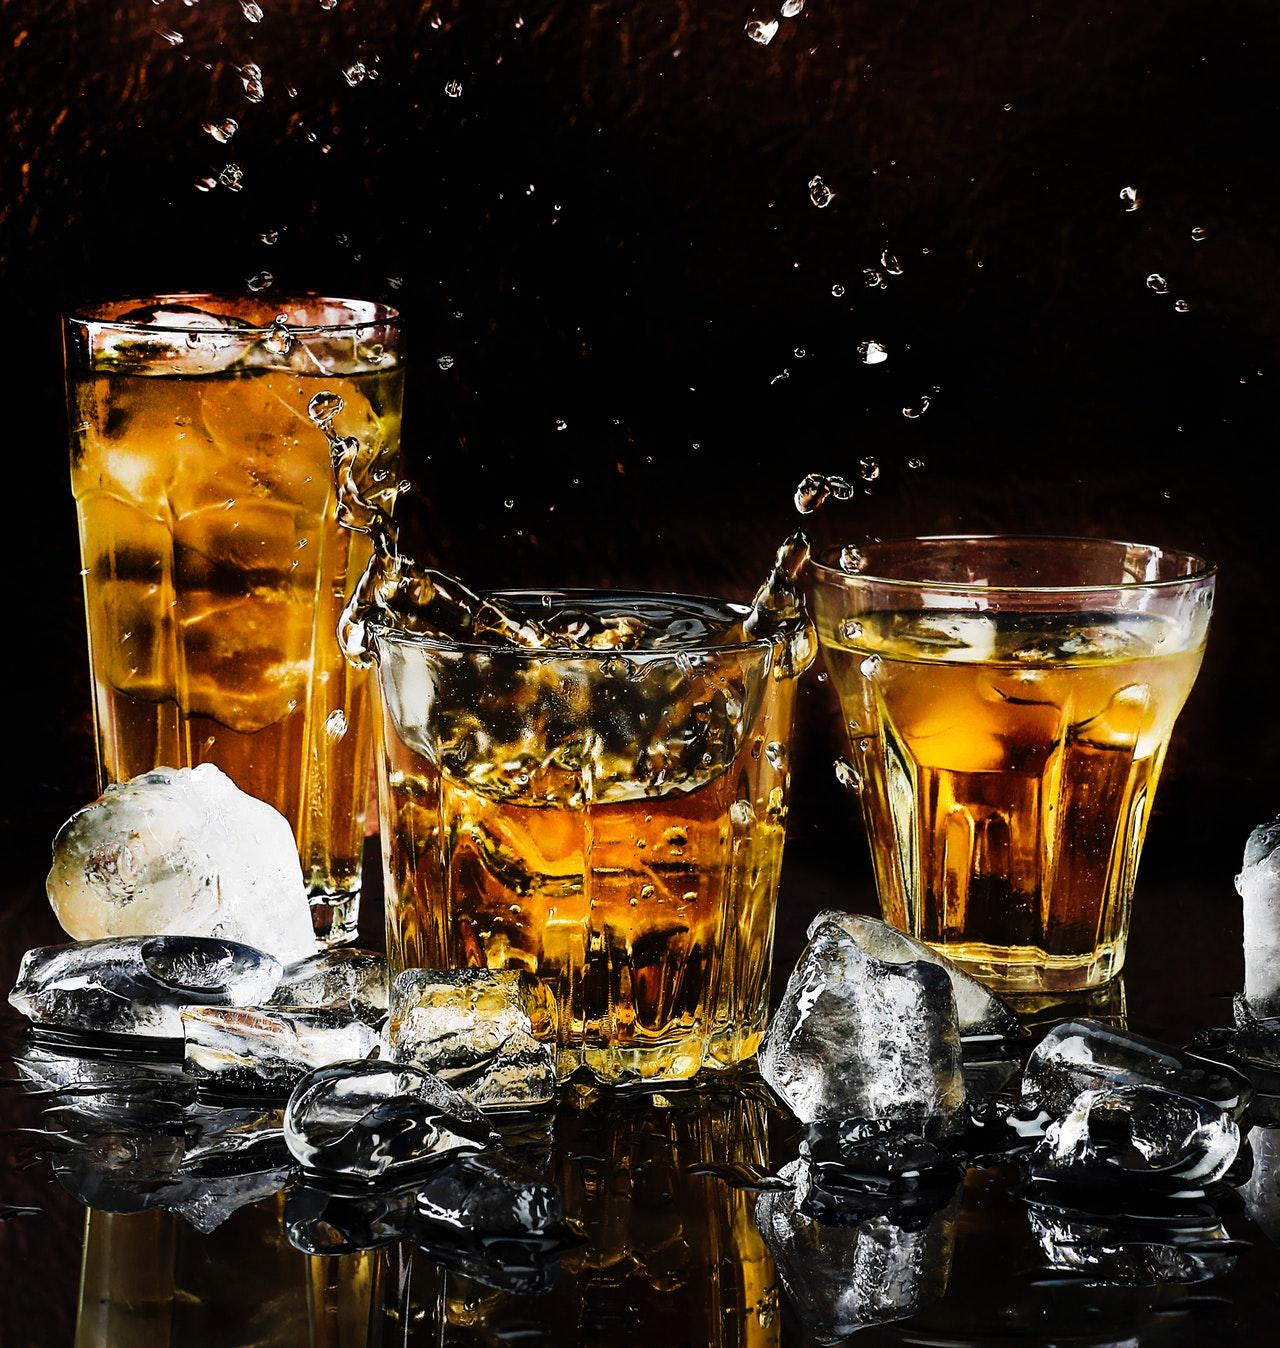 10 X STAINLESS STEEL BOAT//RV TWIN SIZE WINE BOTTLE//CUP//DRINK HOLDERS /& DRAIN